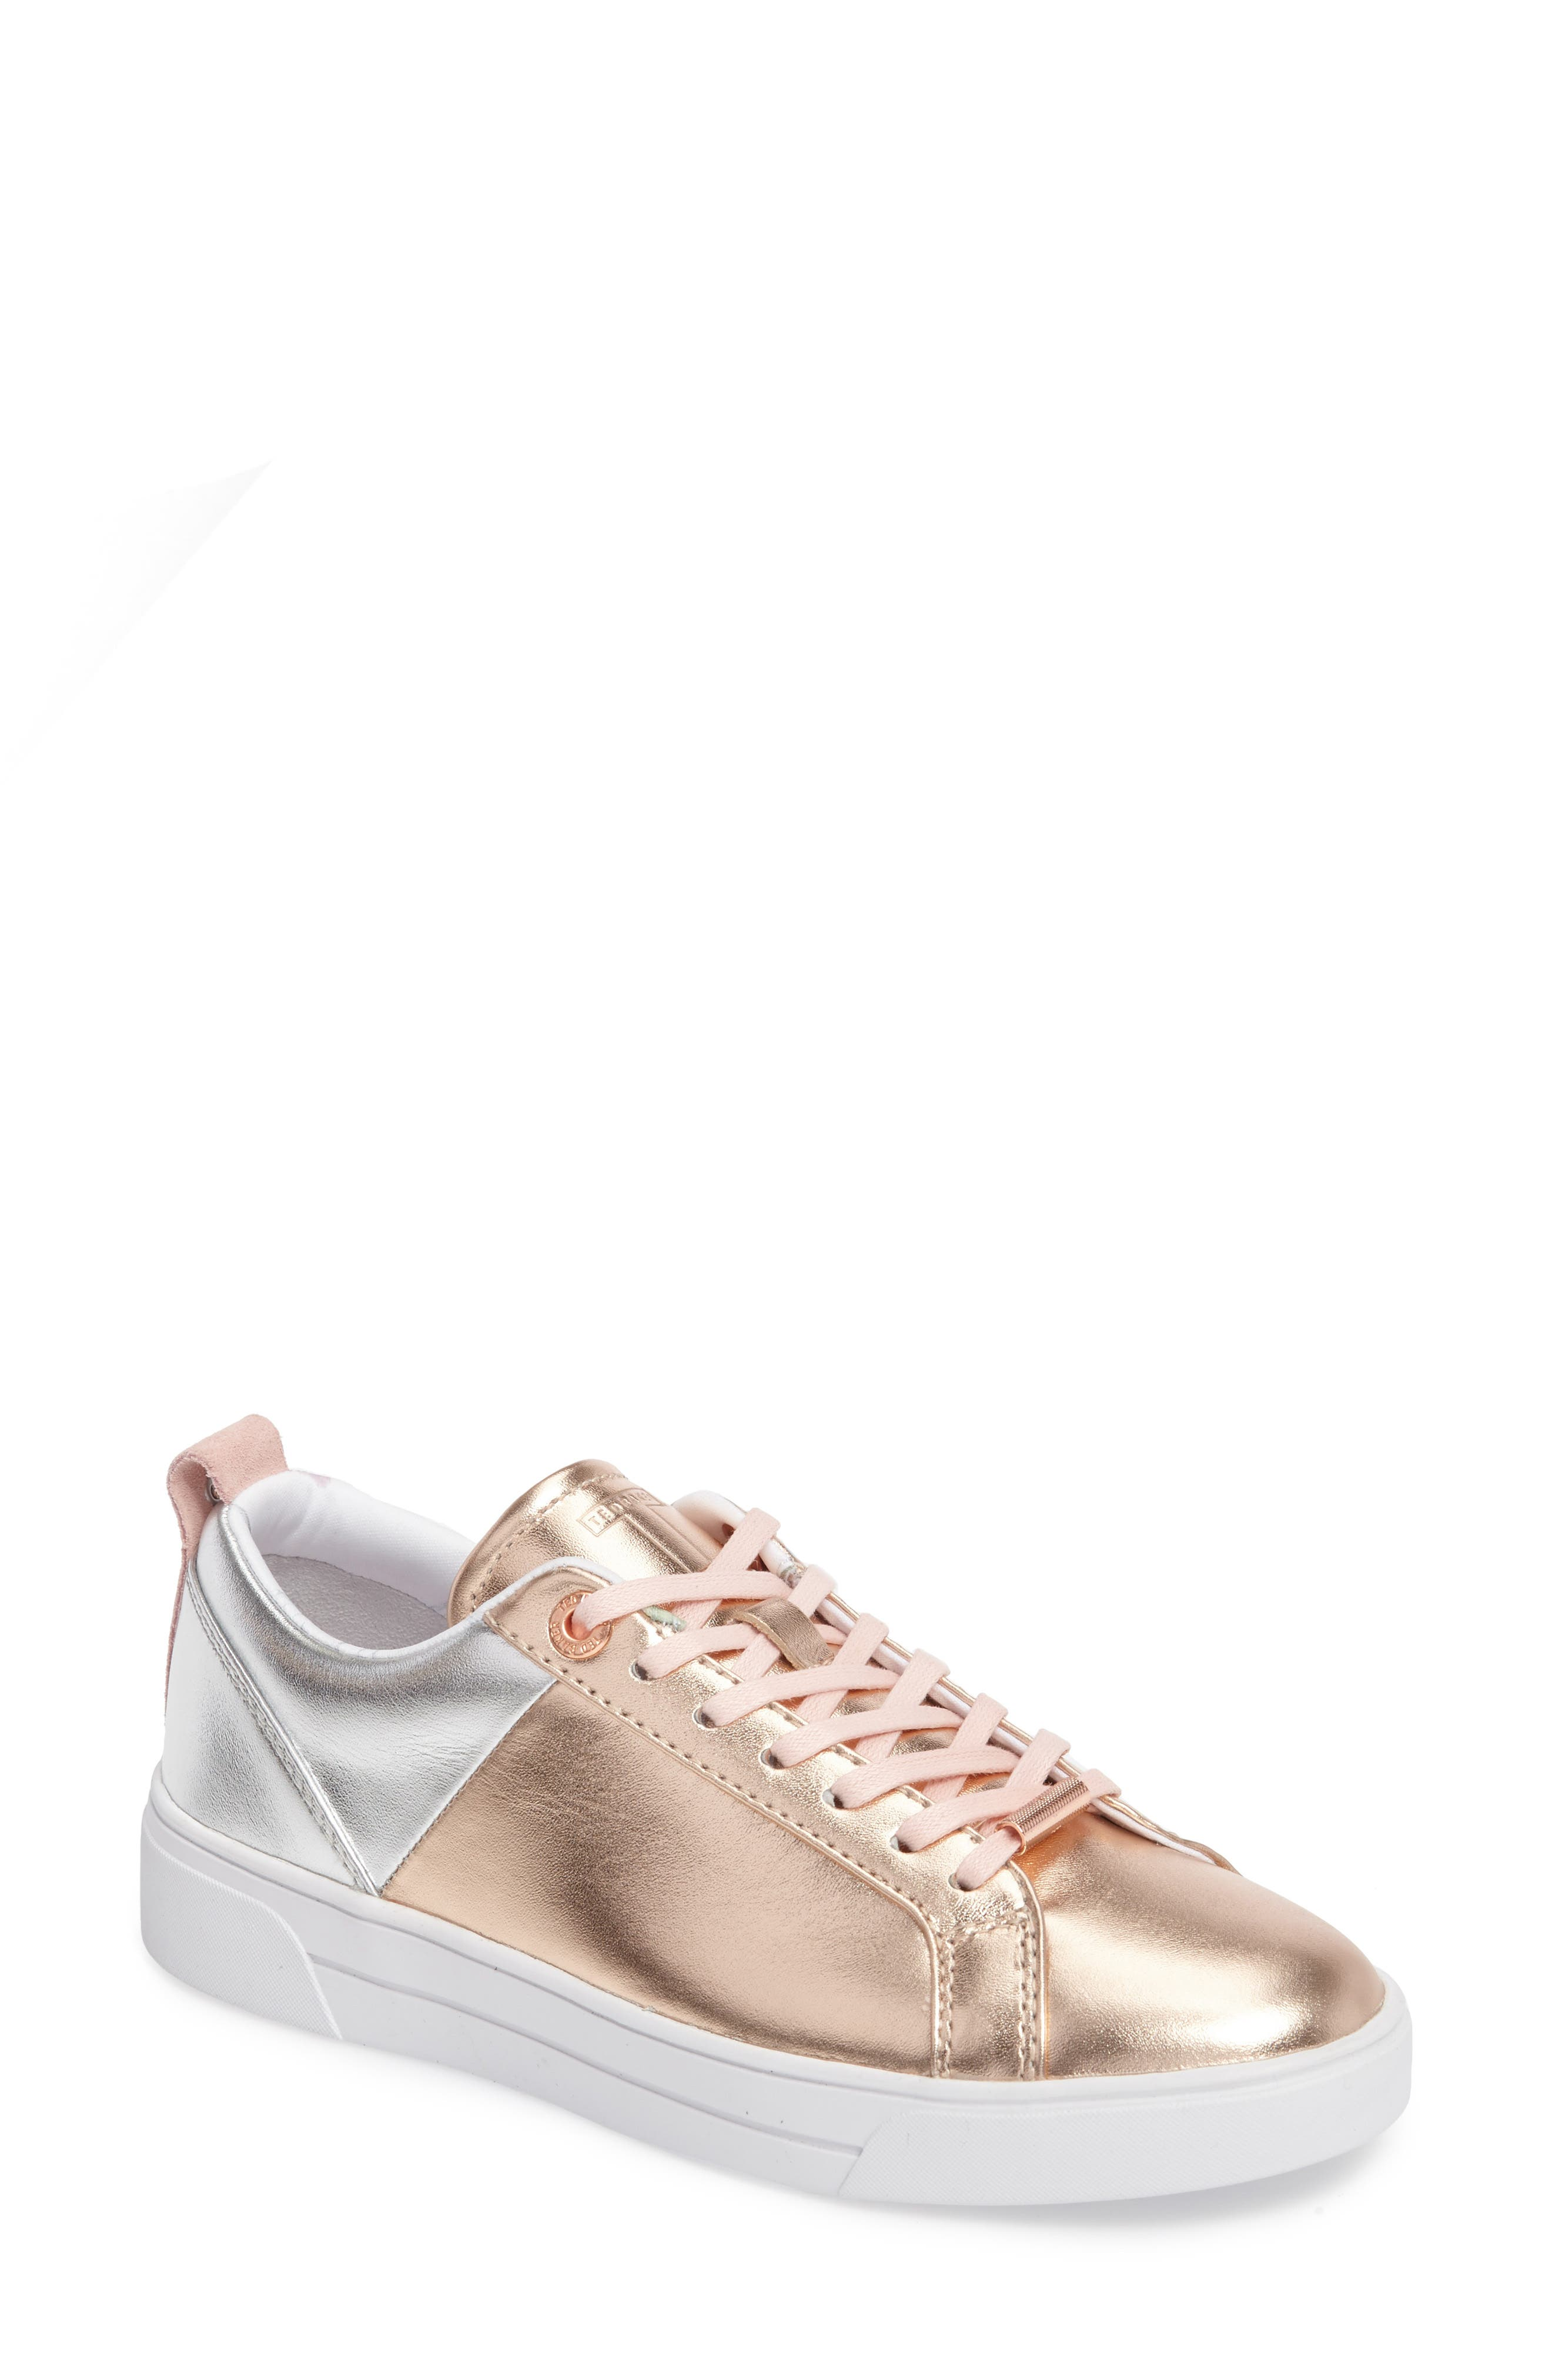 Kulei Lace-Up Sneaker,                             Main thumbnail 2, color,